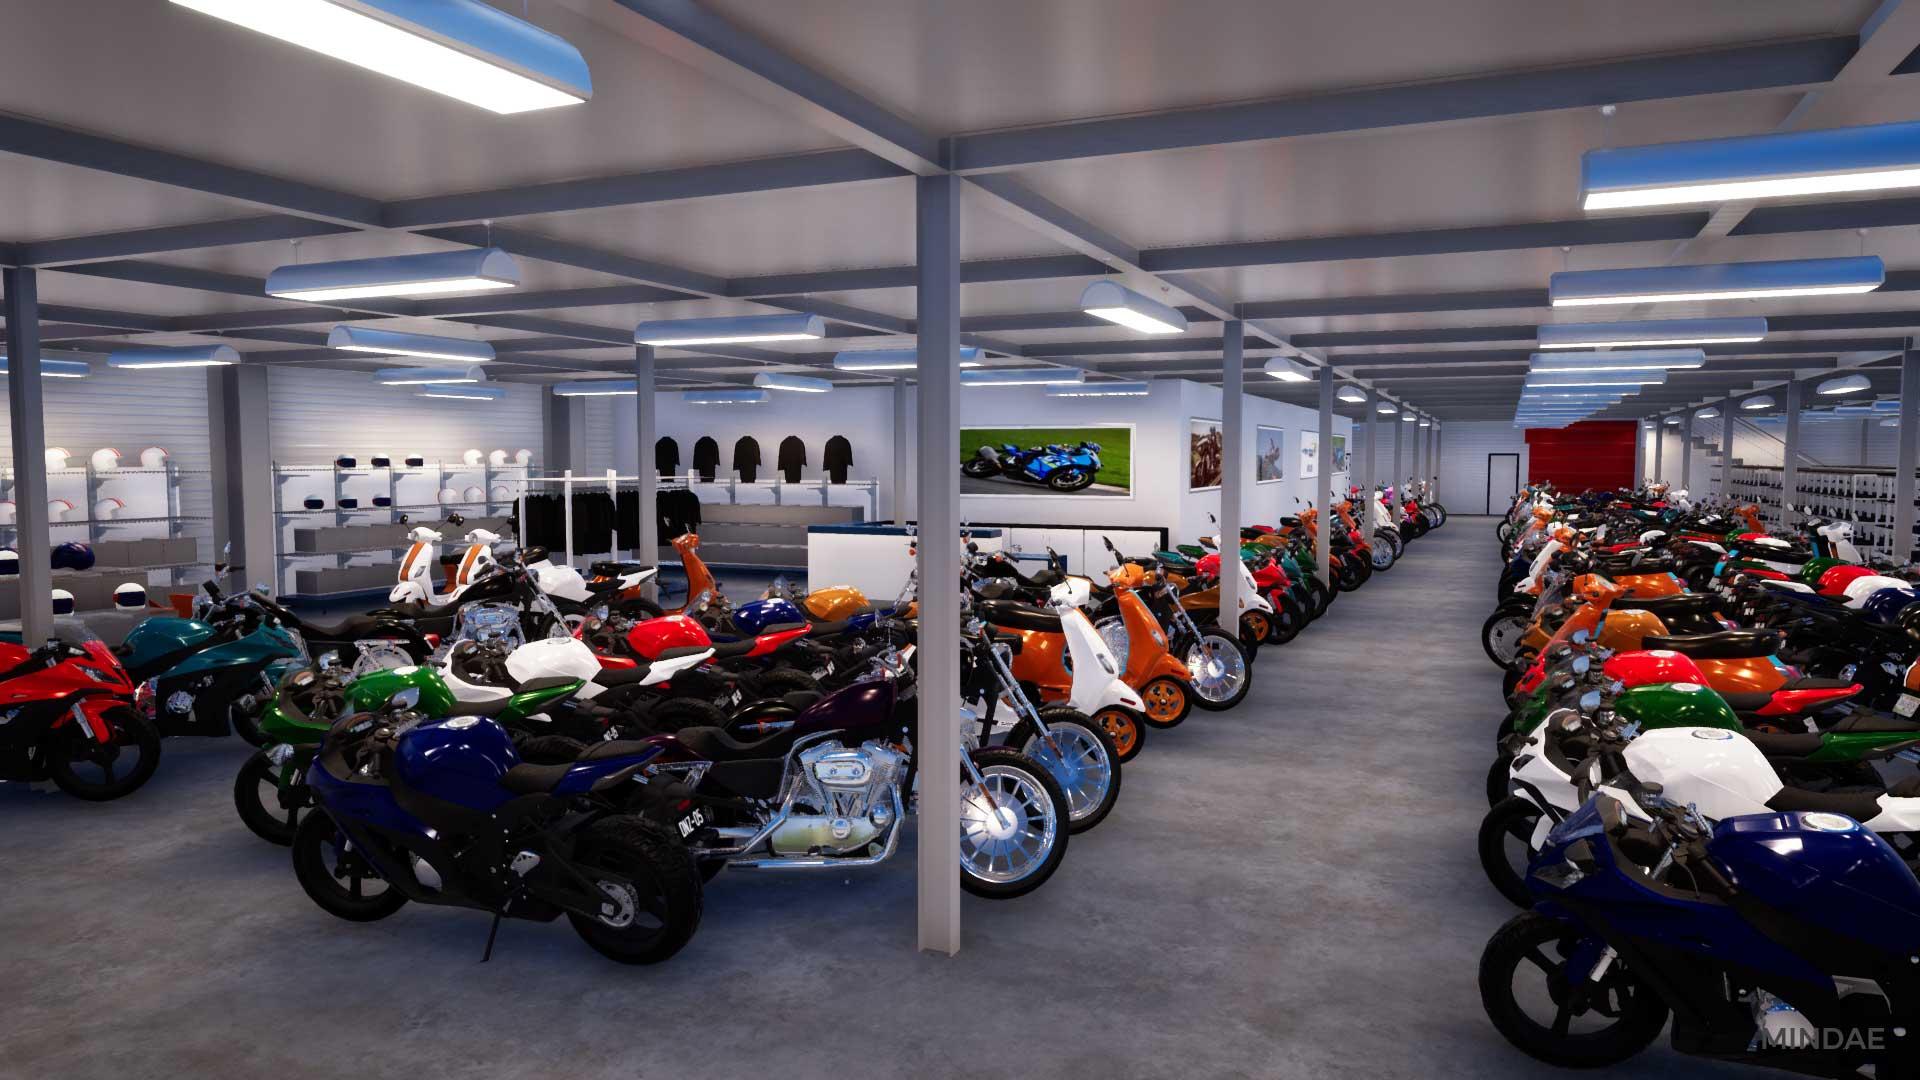 Mindae_3D_B-ingenierie_Industrie_moto_garage_Calvados-(11)